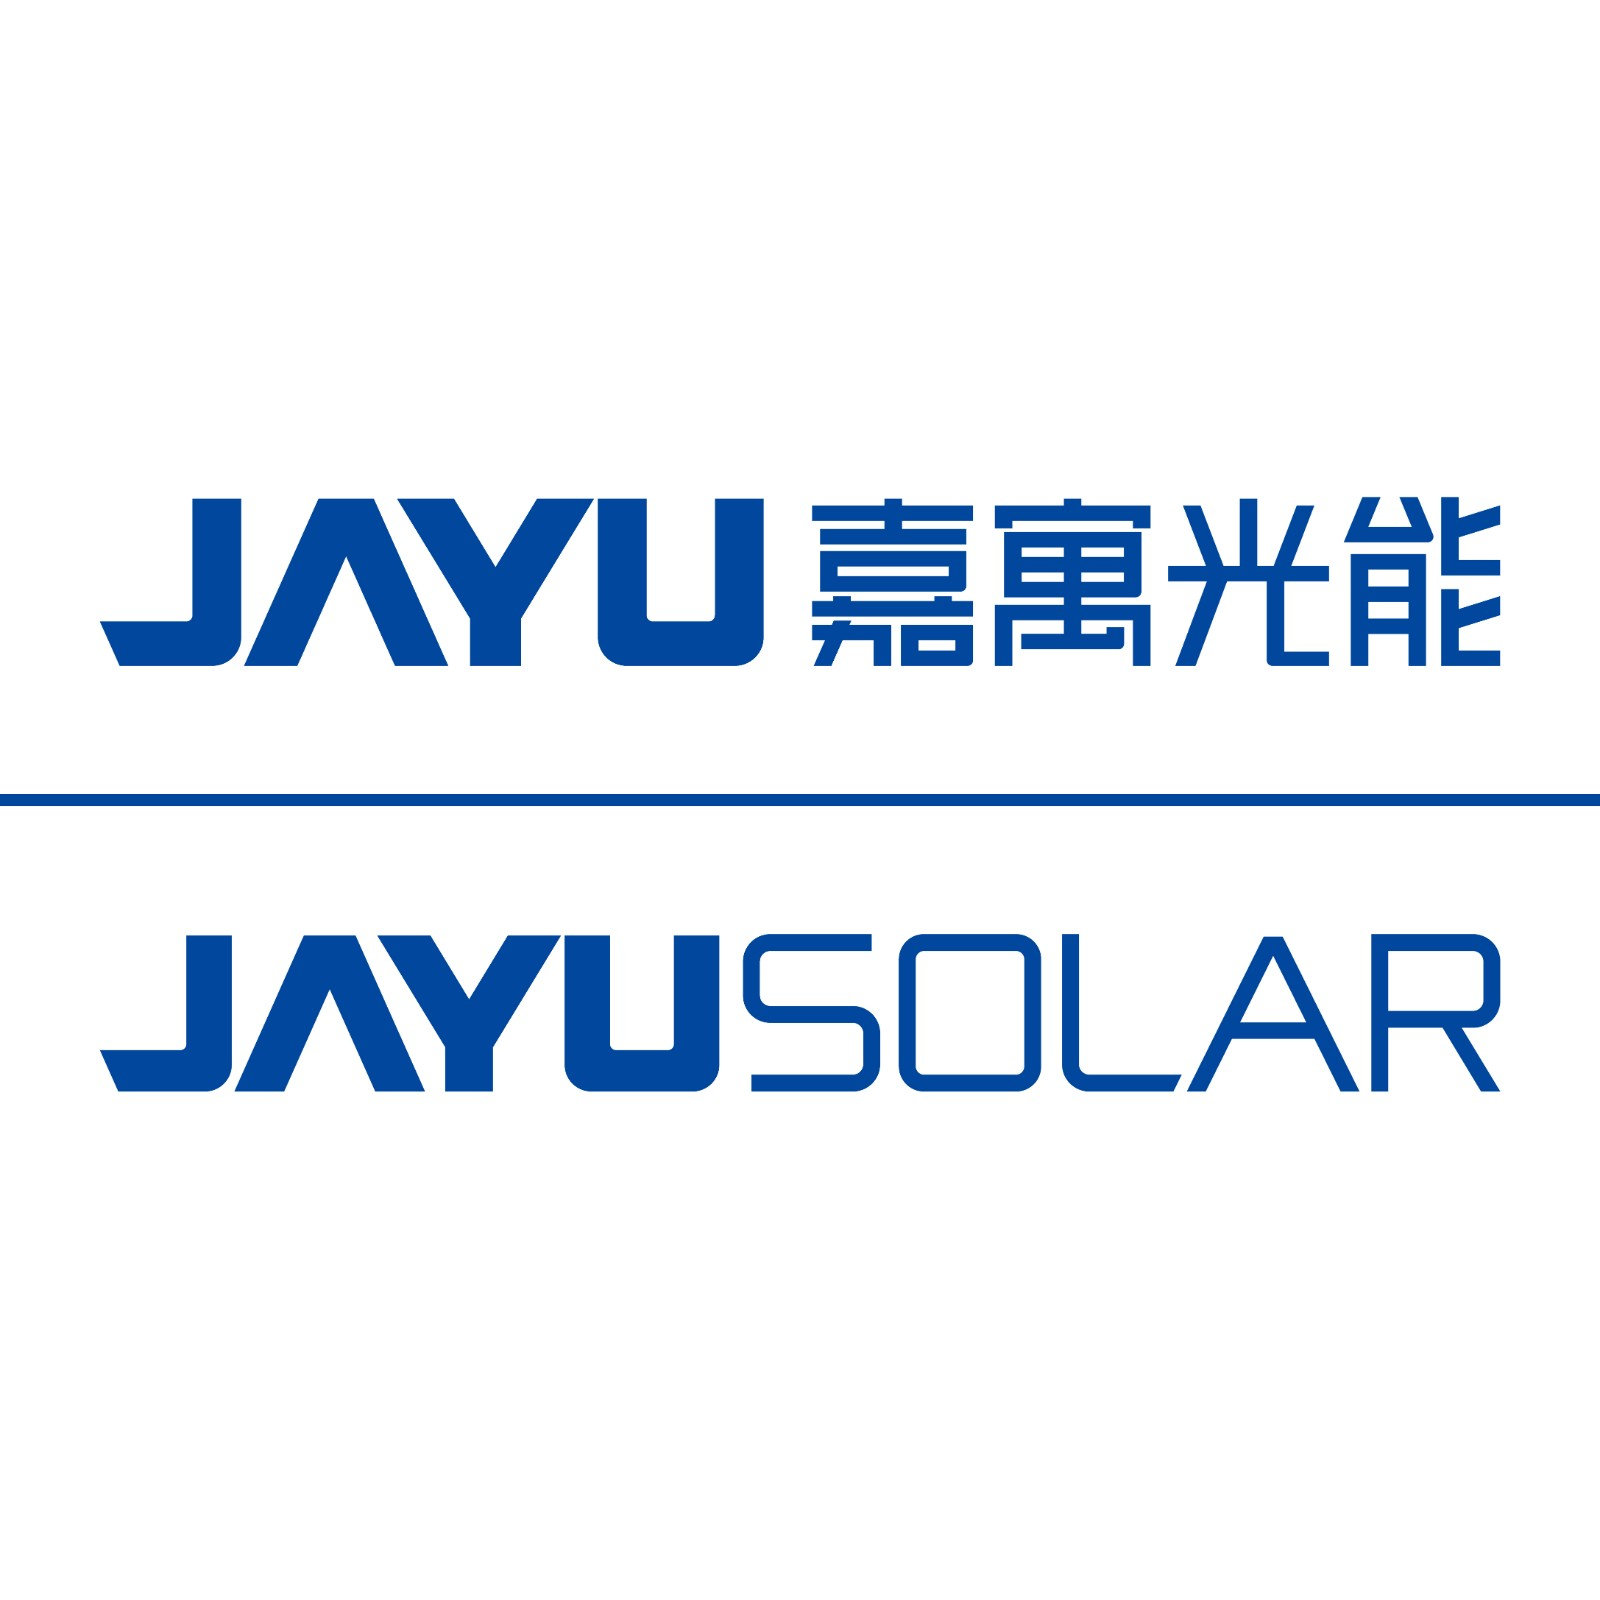 XUZHOU JIAYU SOLAR ENERGY TECHNOLOGY CO.,LTD.